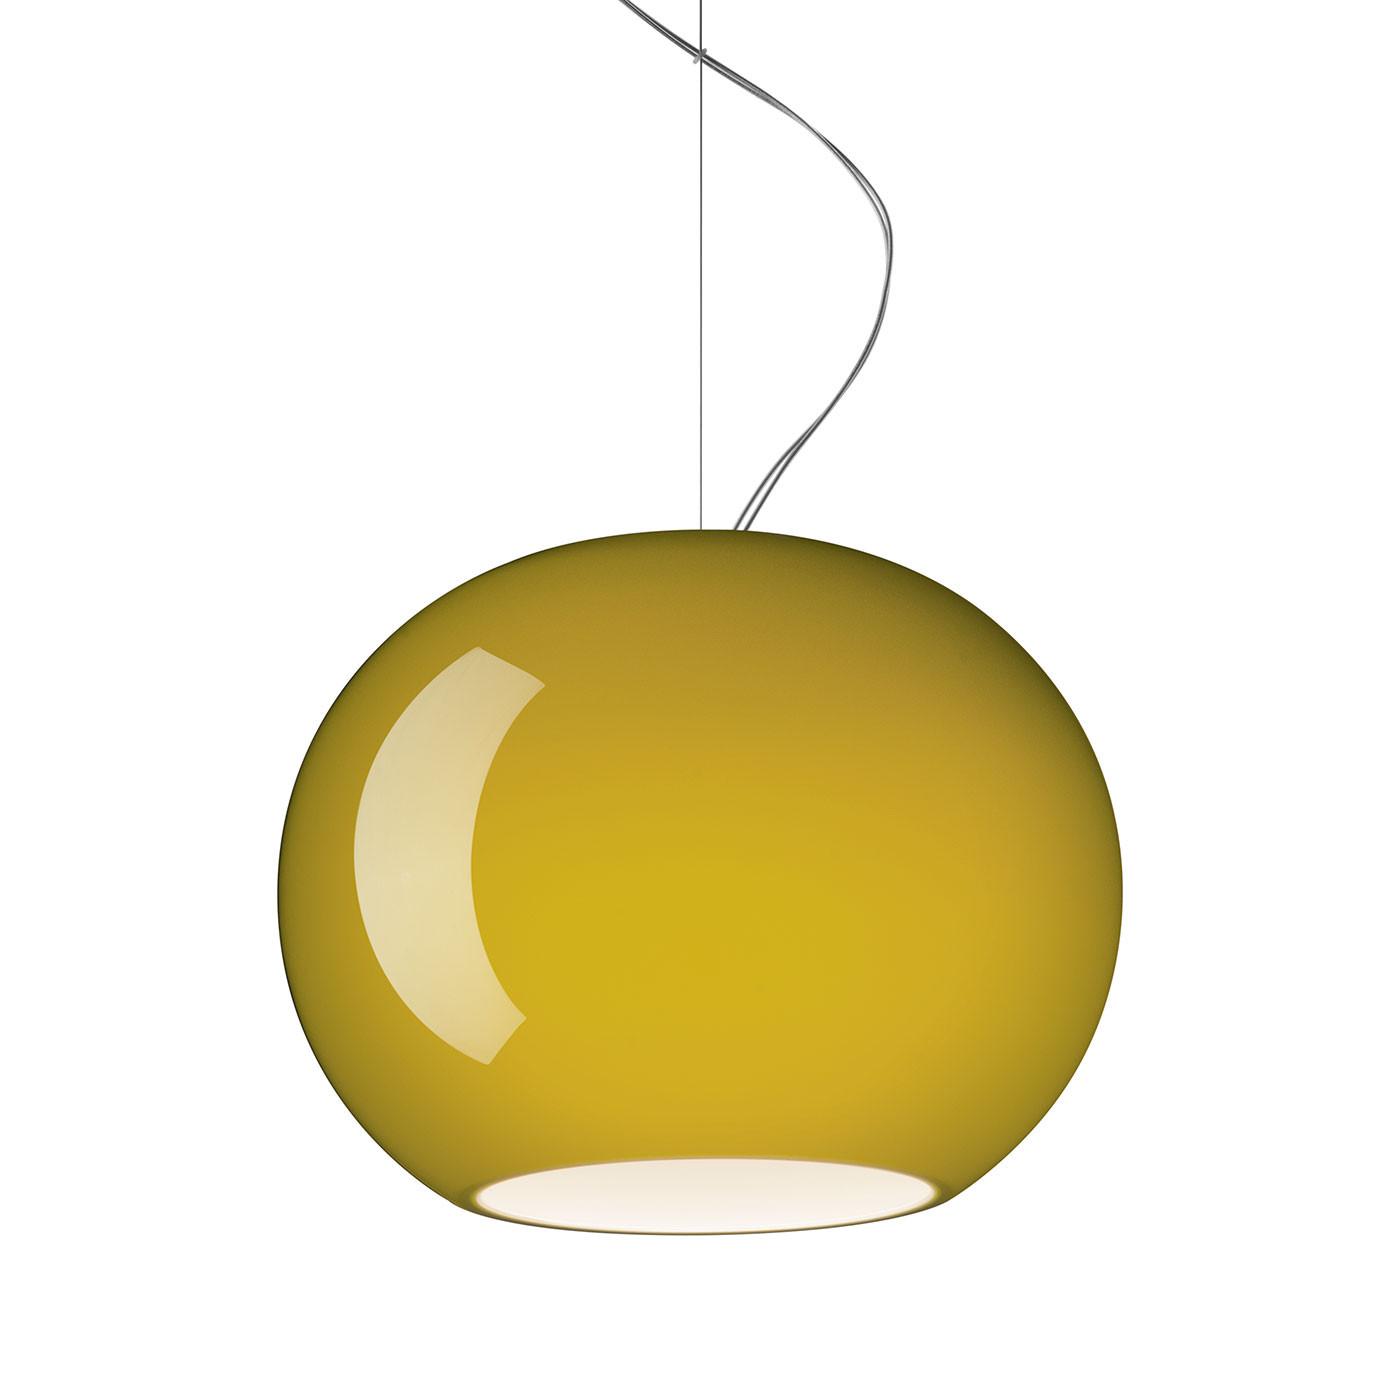 Foscarini Buds 3 Sospensione LED